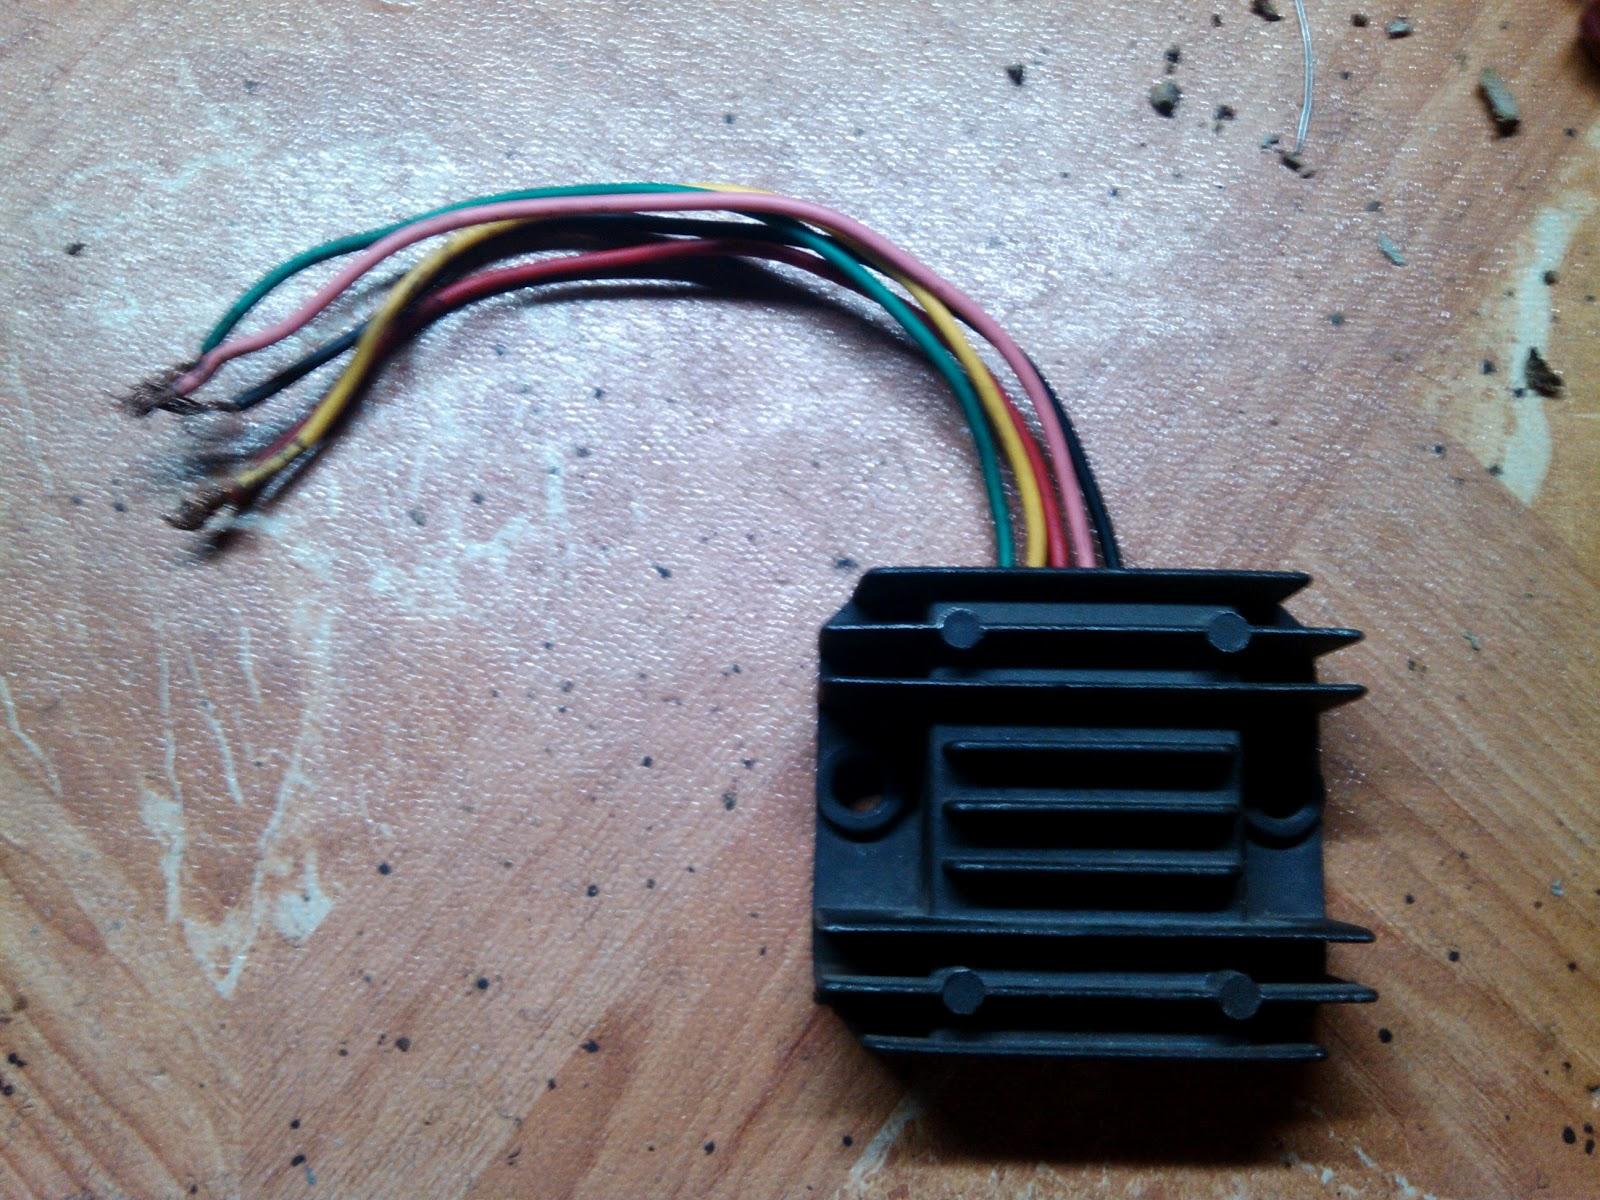 Yamaha Mio Soul Electrical Wiring Diagram 2000 Mustang Gt Radio Suzuki Raider 115 Fi Library Full Wave Regulator Schematic